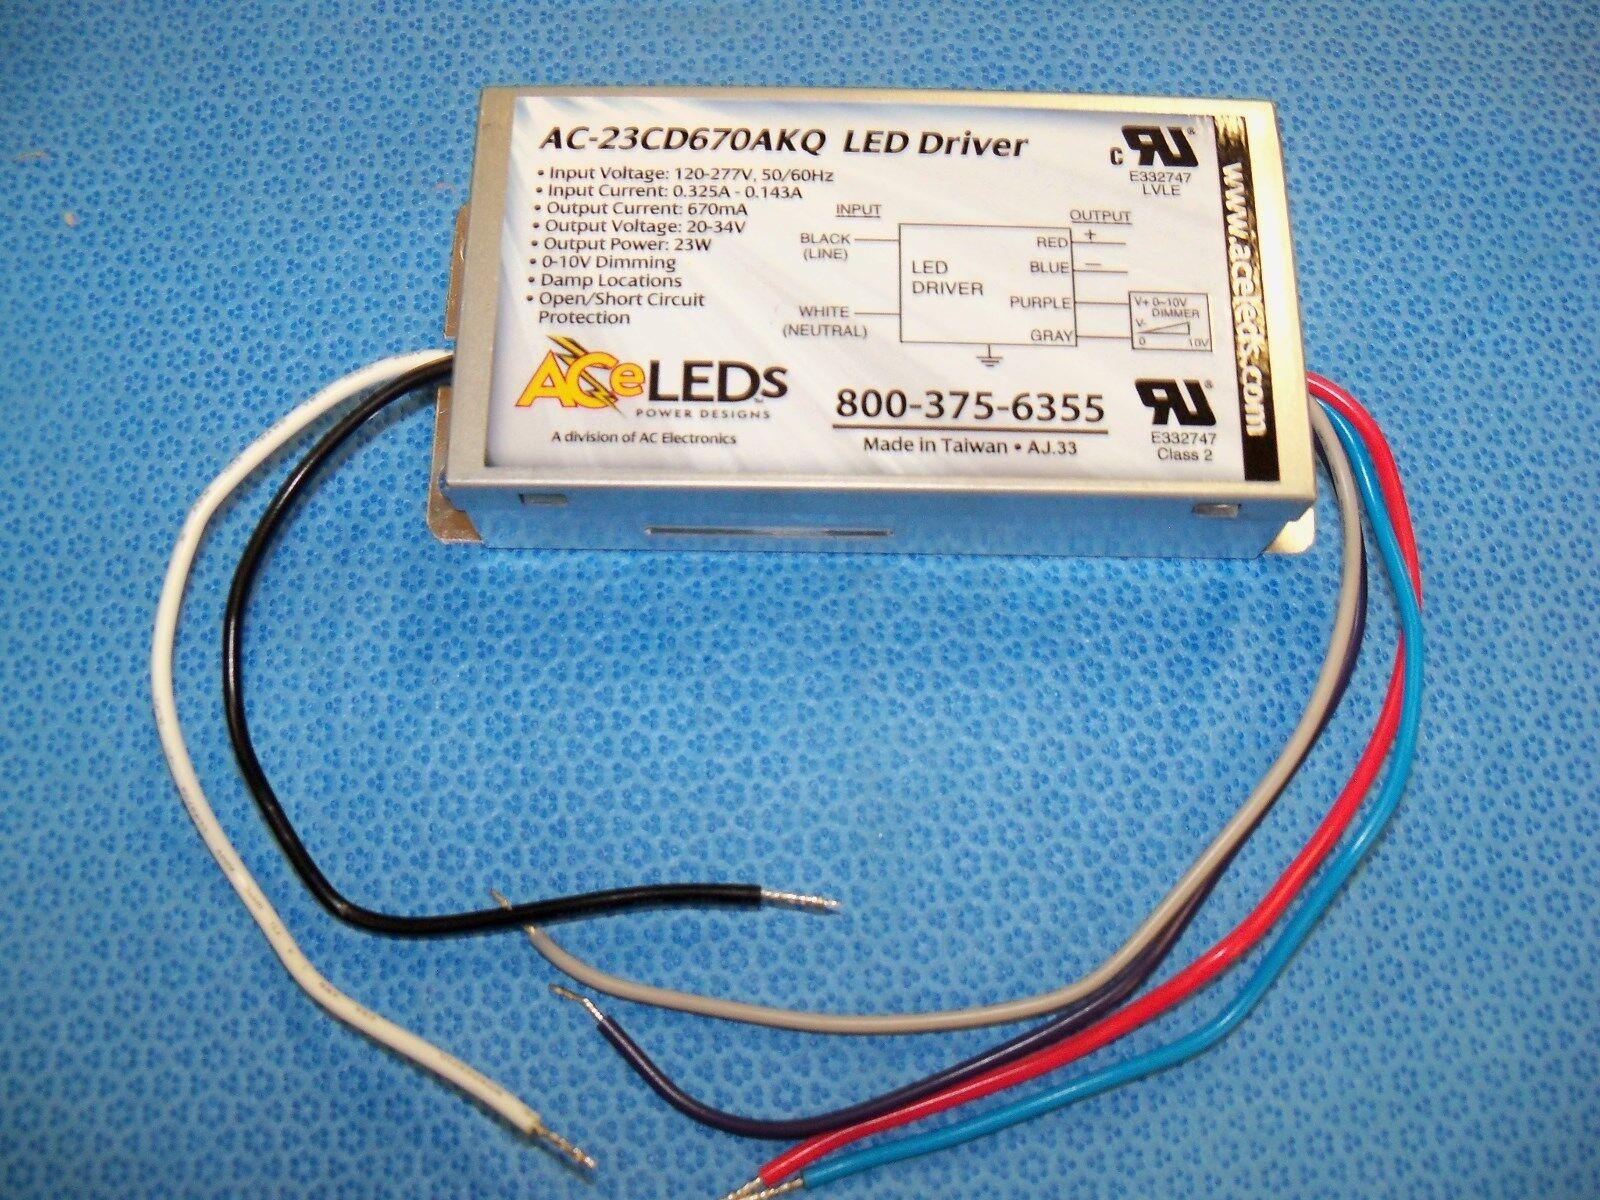 Ace LEDs Ac-23cd670akq LED Driver AC Electronics Ballast | eBay